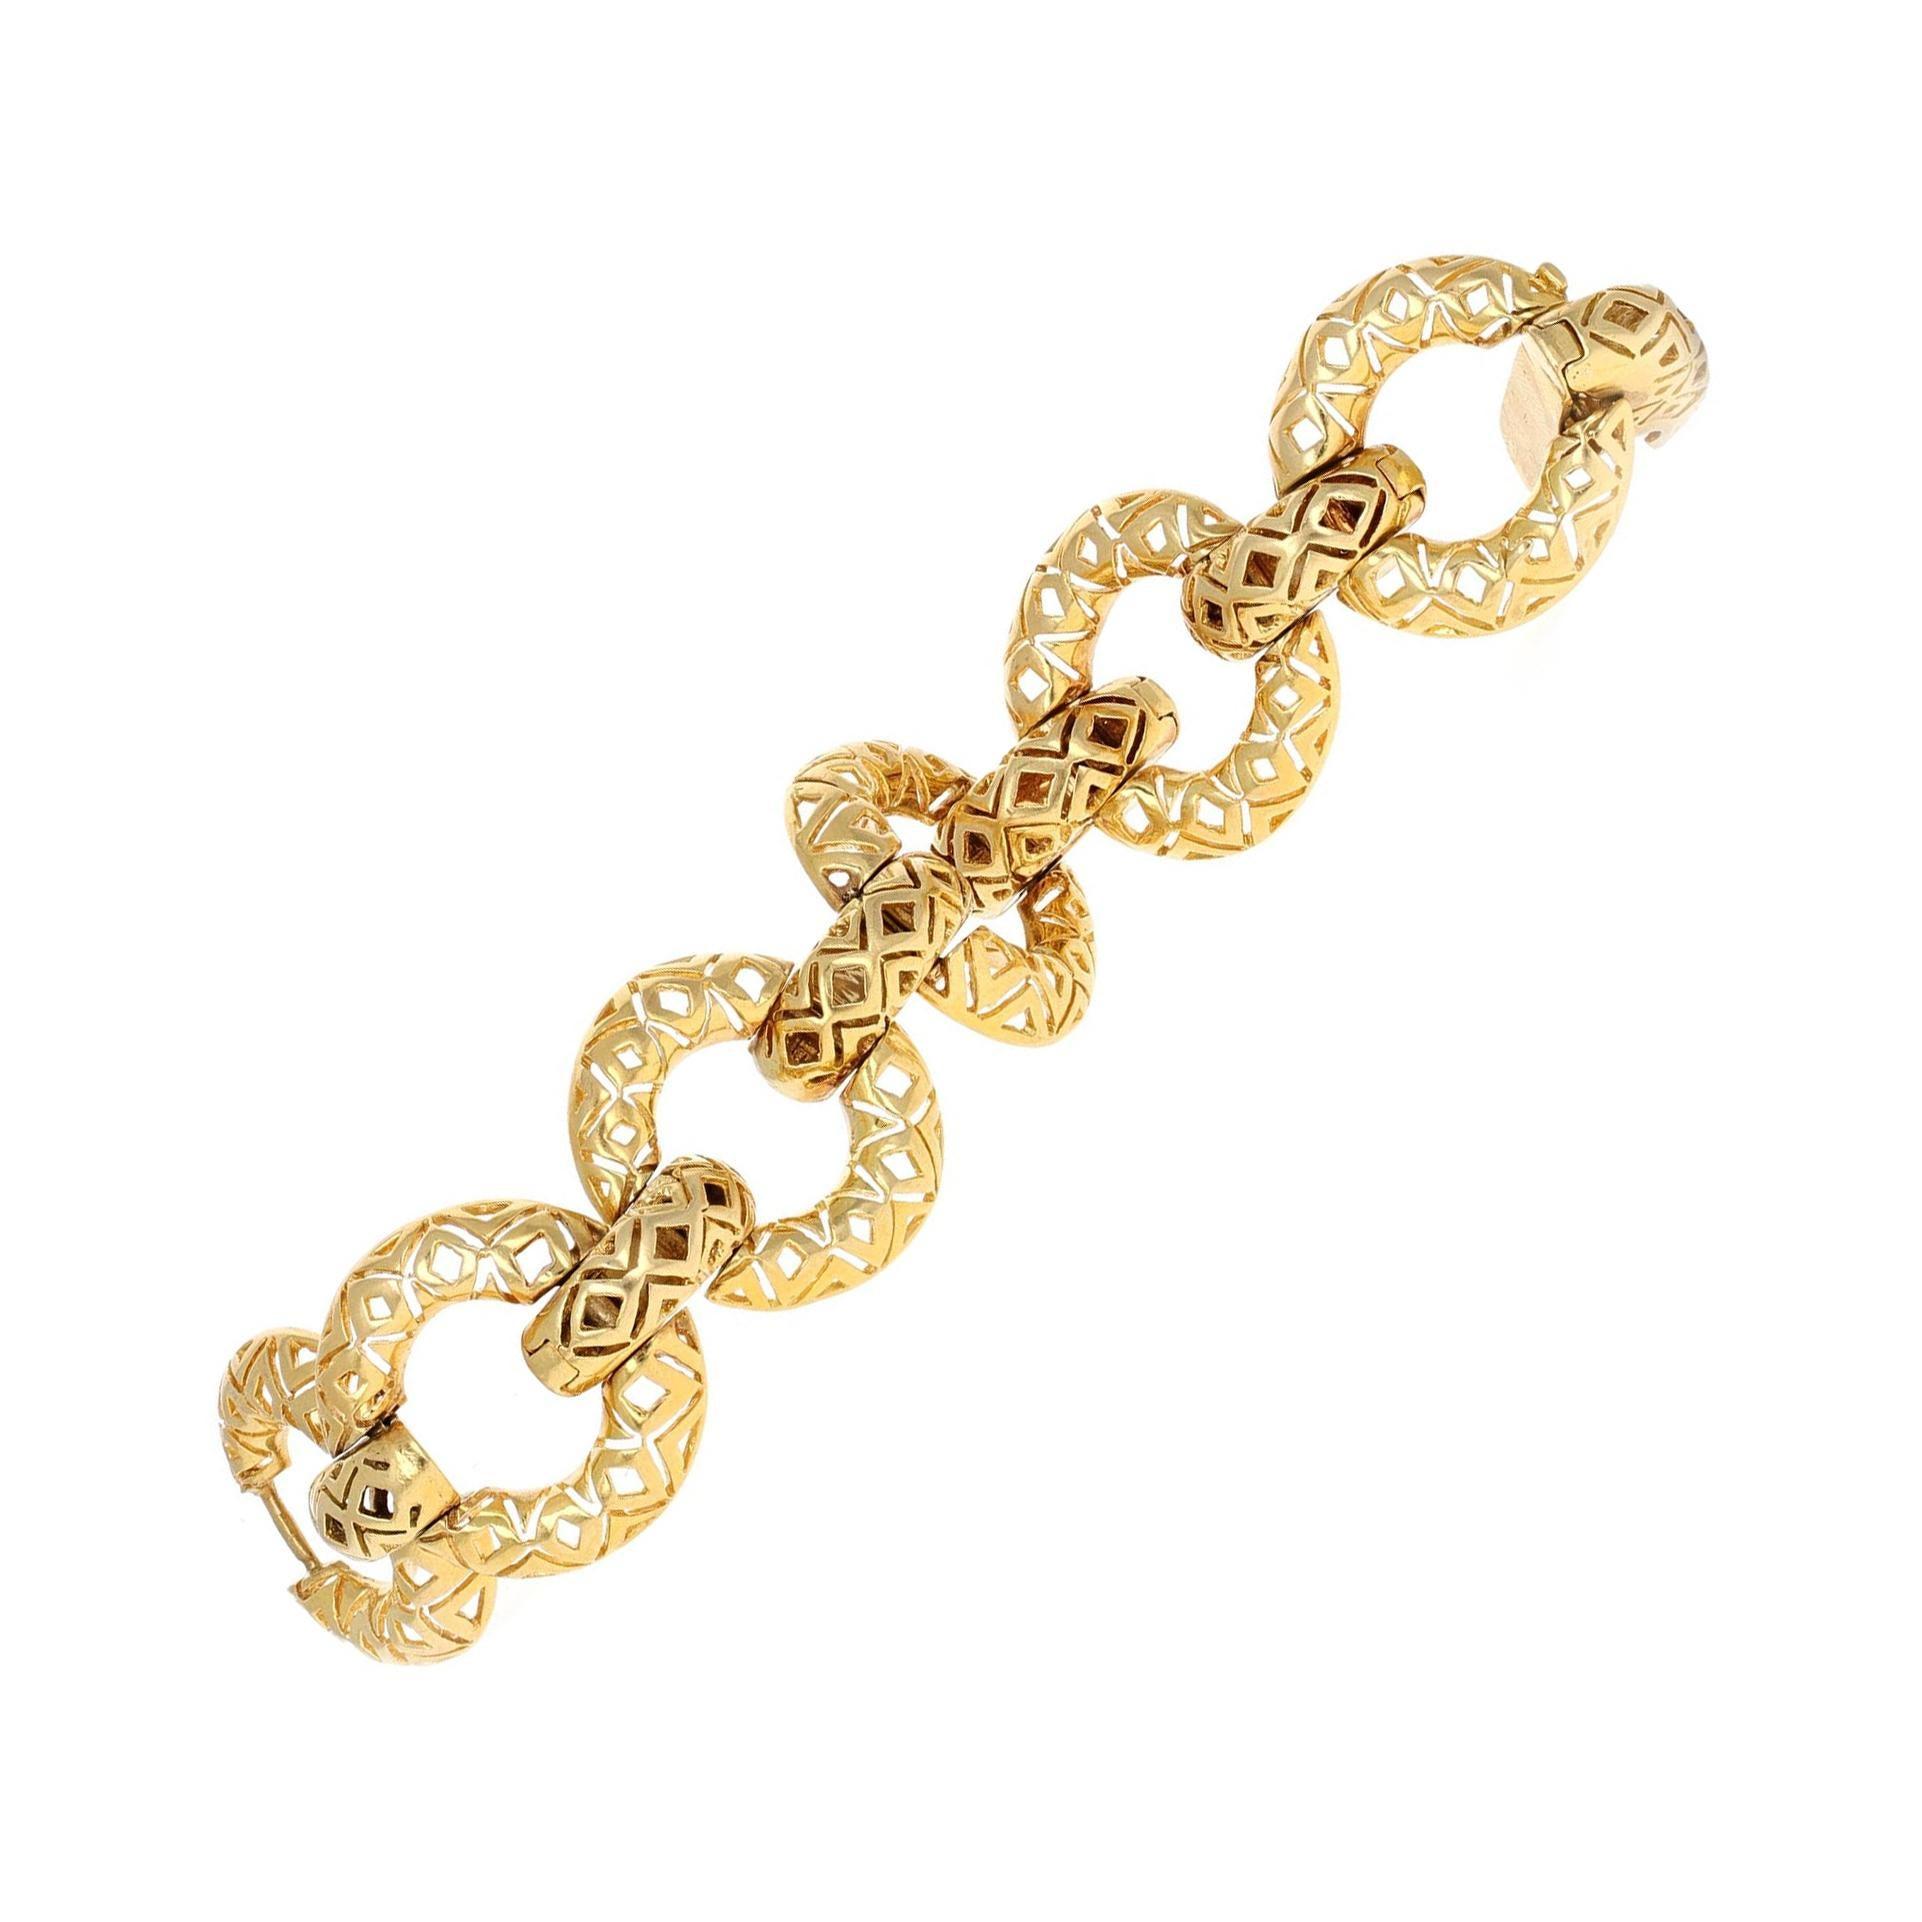 Tiffany & Co. Retro Link Bracelet